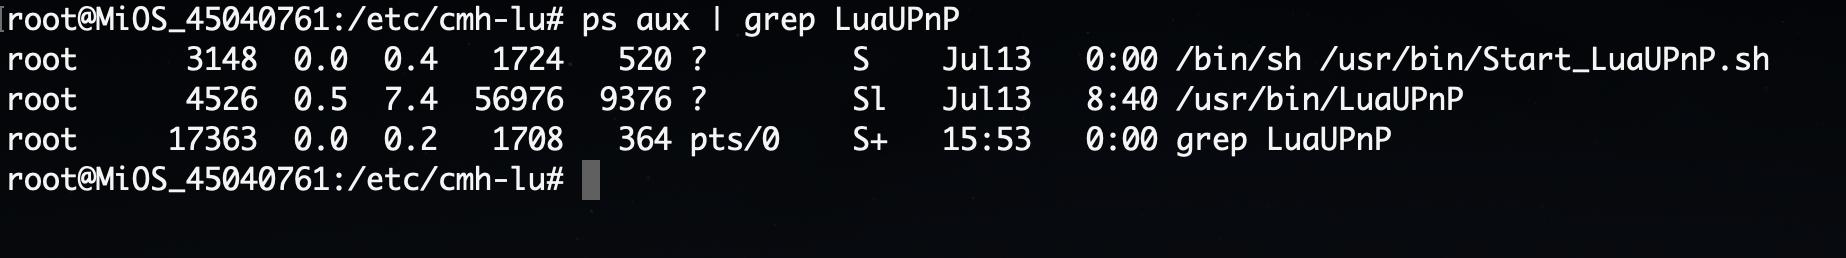 luaupnp-runs-as-root.png